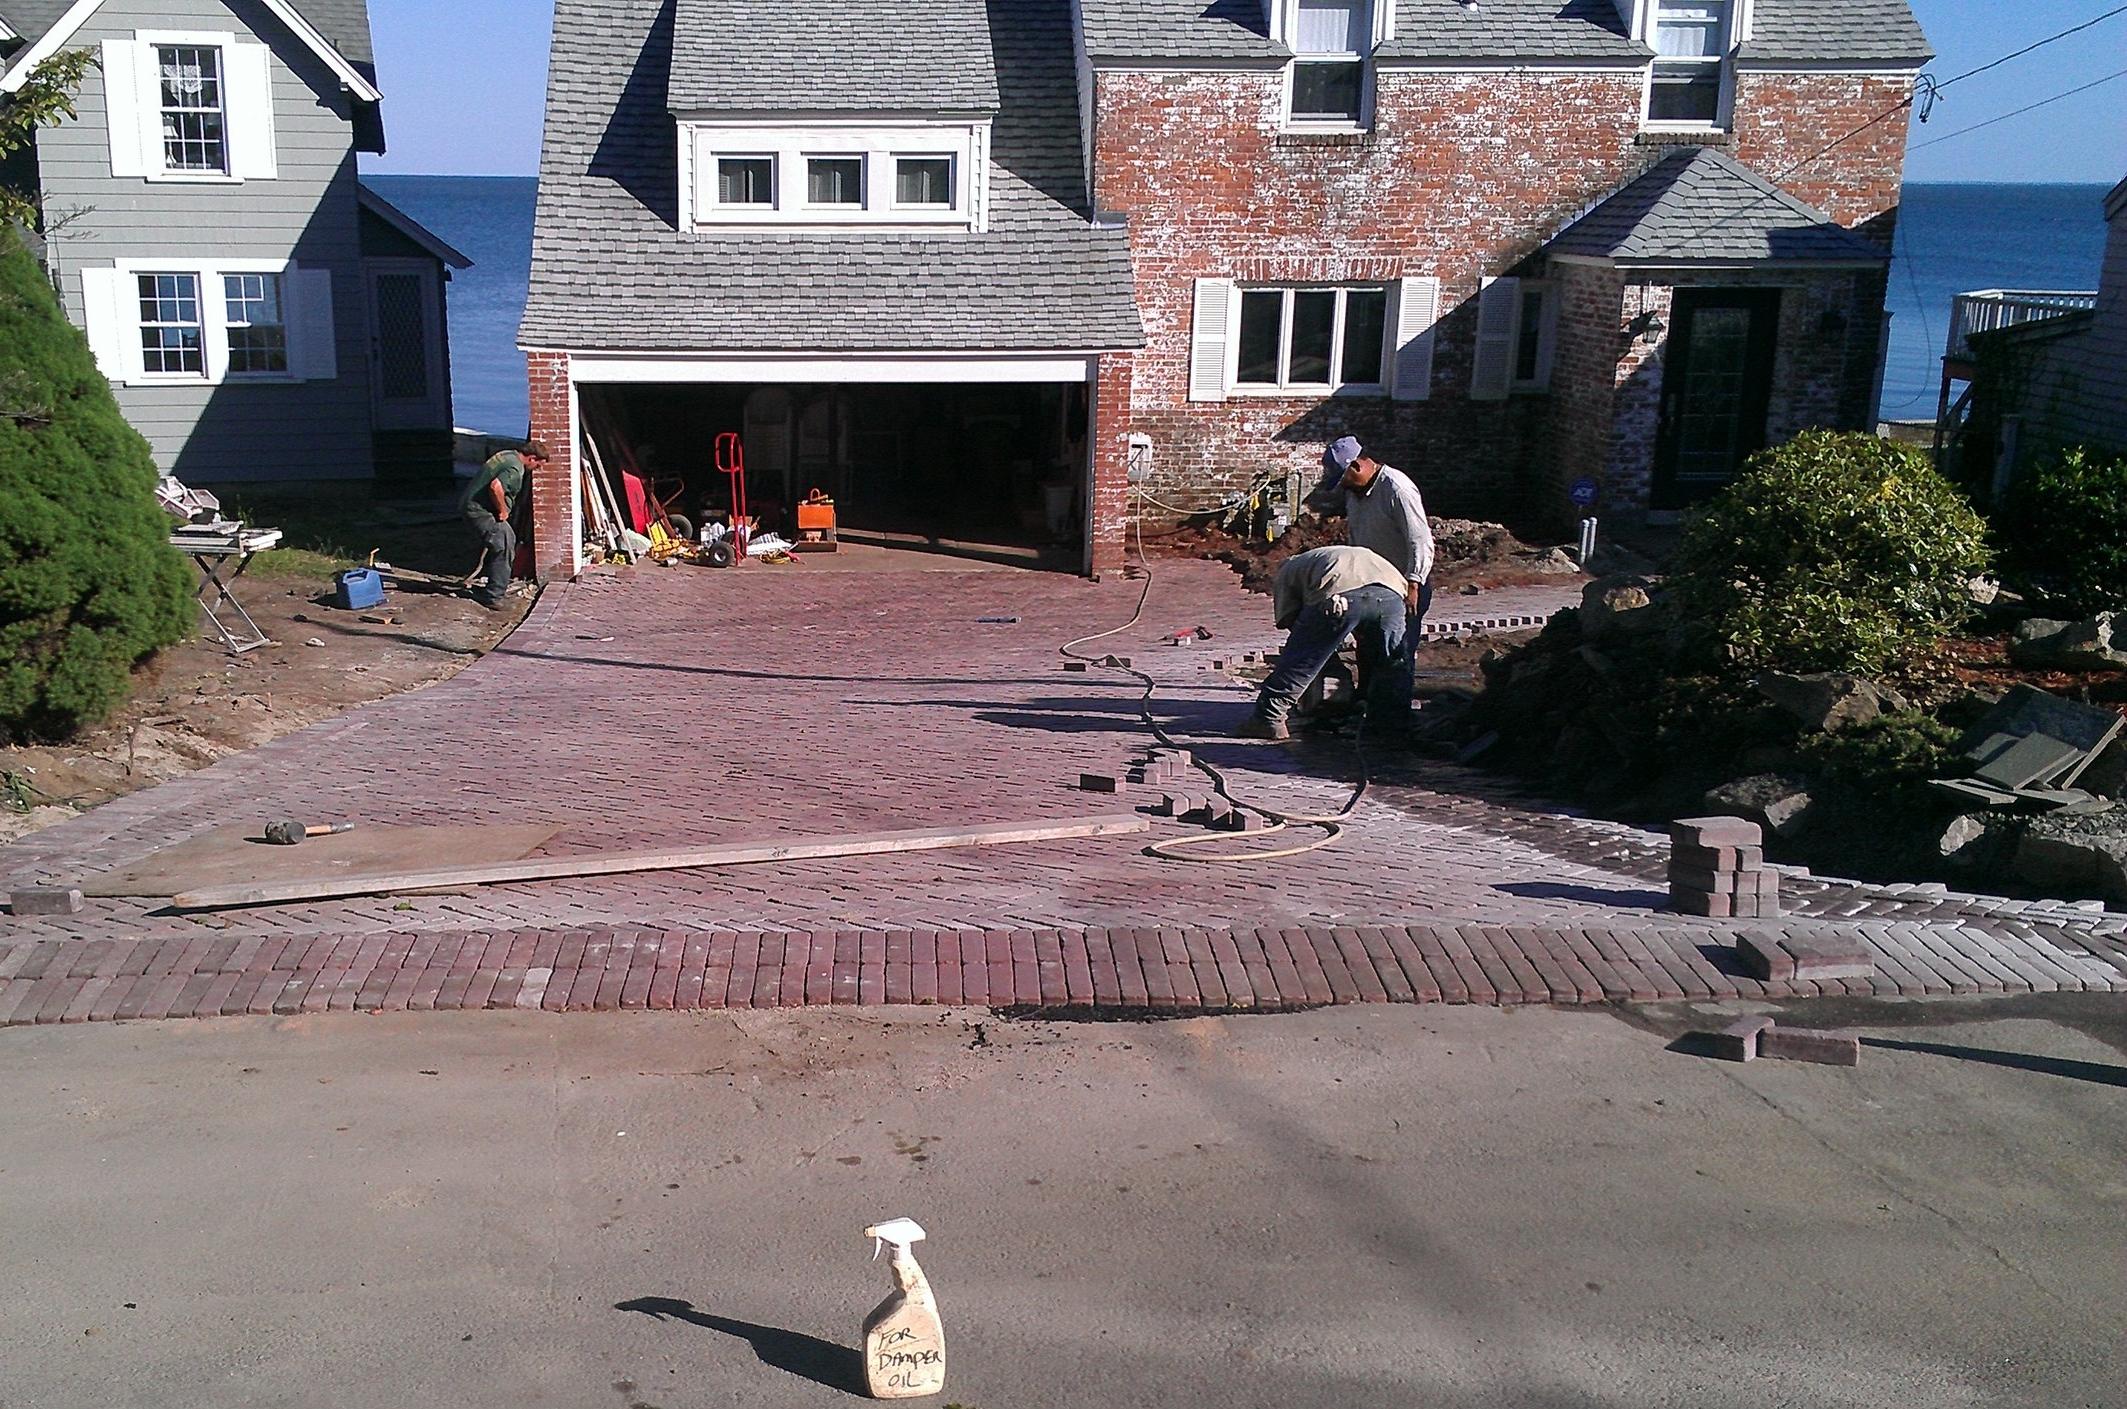 Brick Paver Driveway in Progress